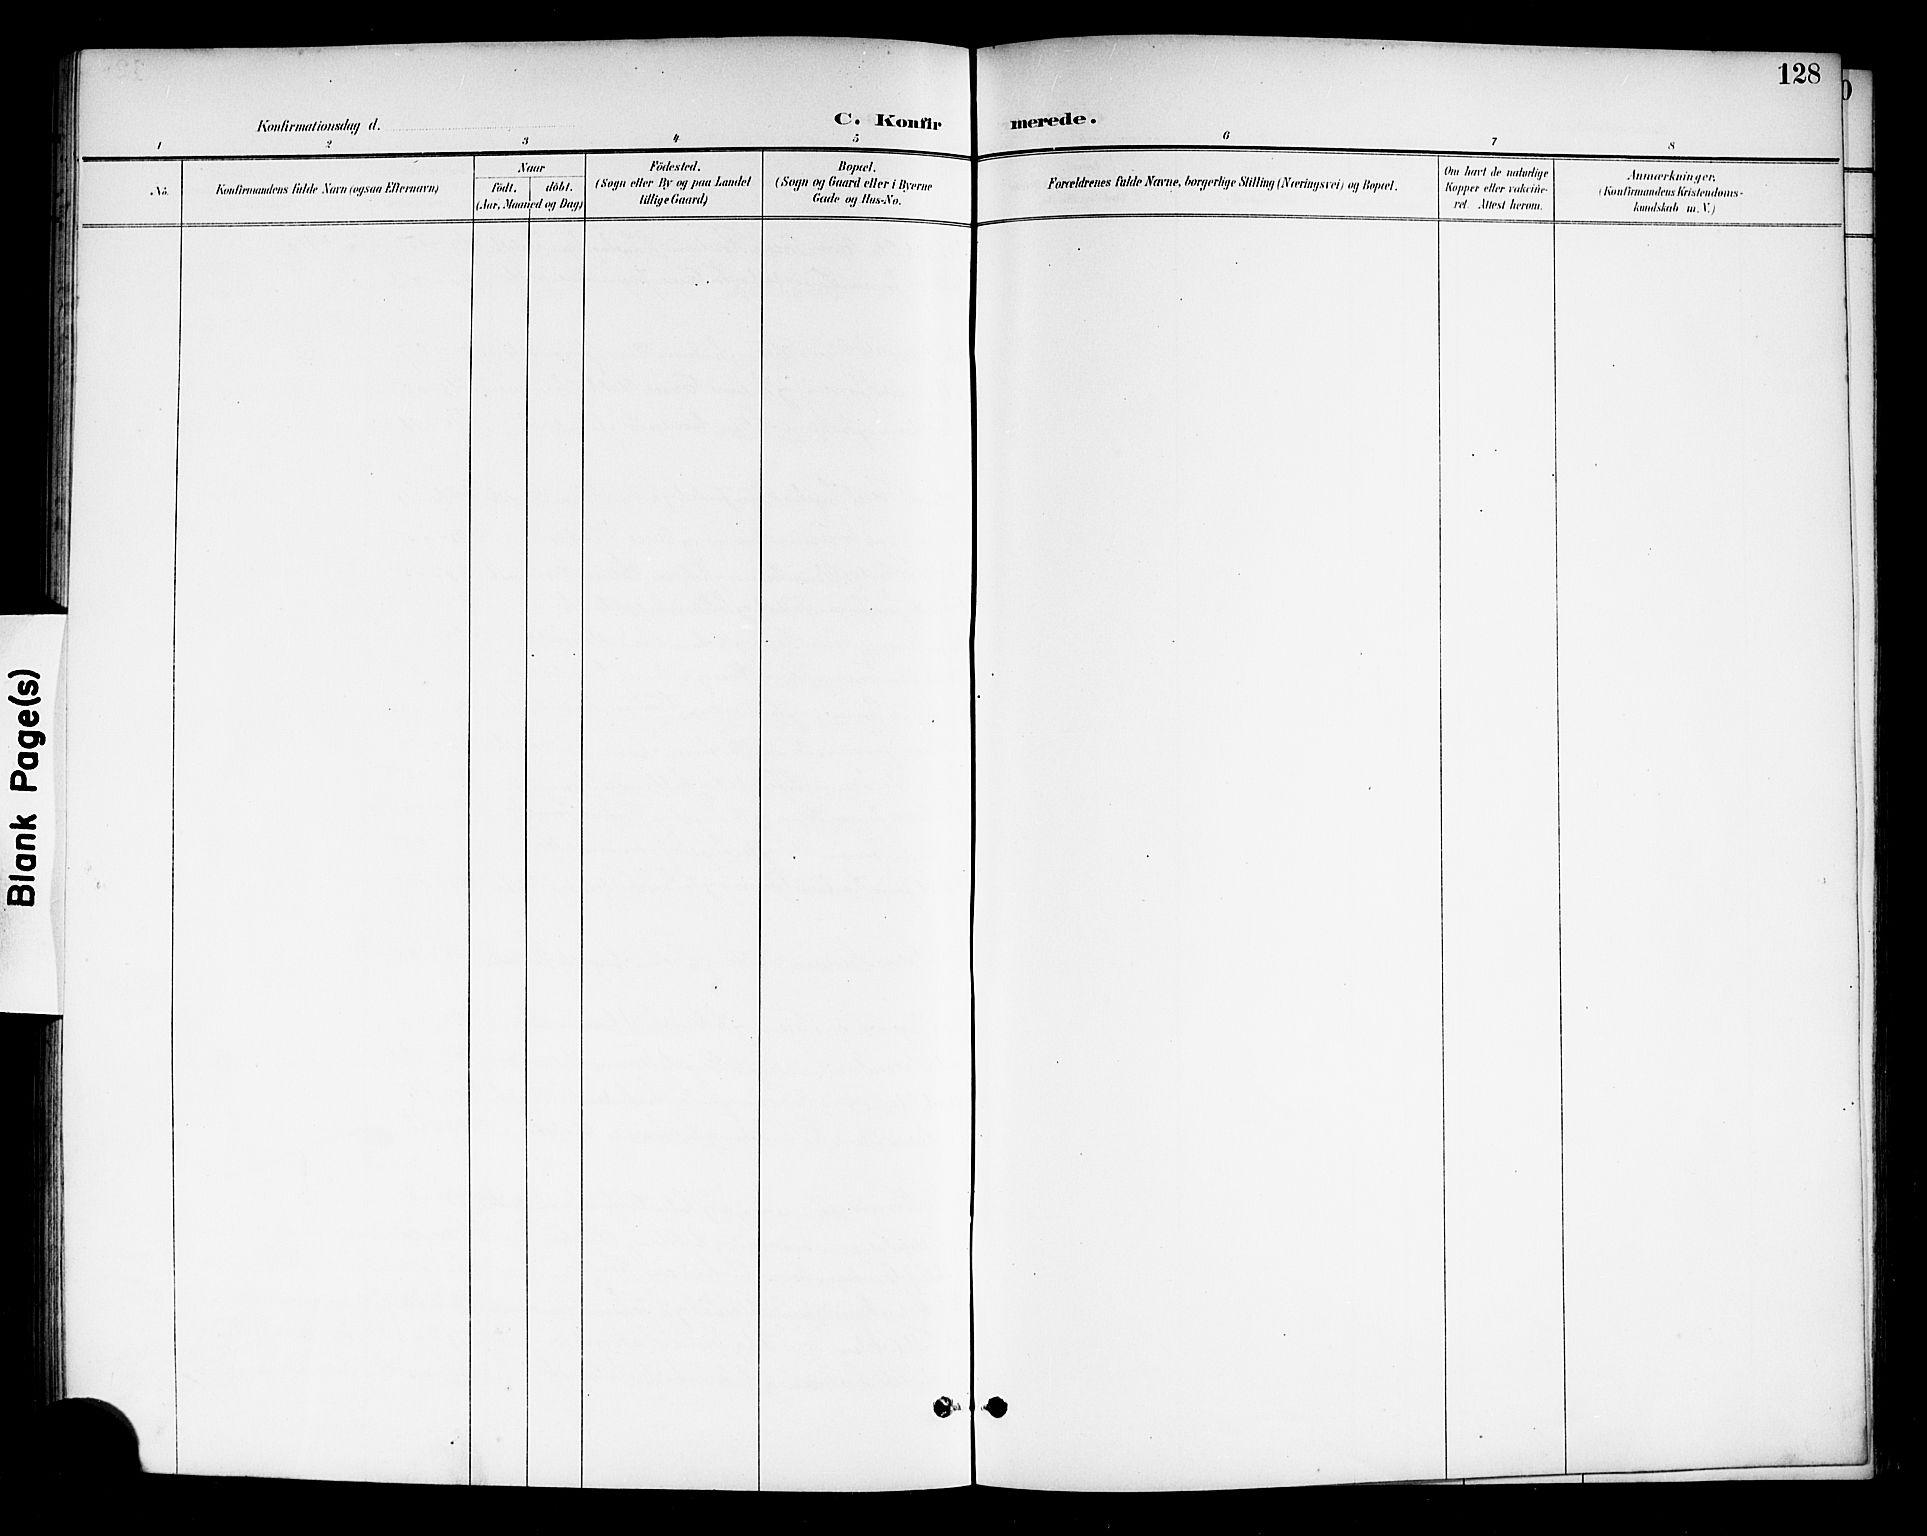 SAKO, Drangedal kirkebøker, G/Gb/L0002: Klokkerbok nr. II 2, 1895-1918, s. 128